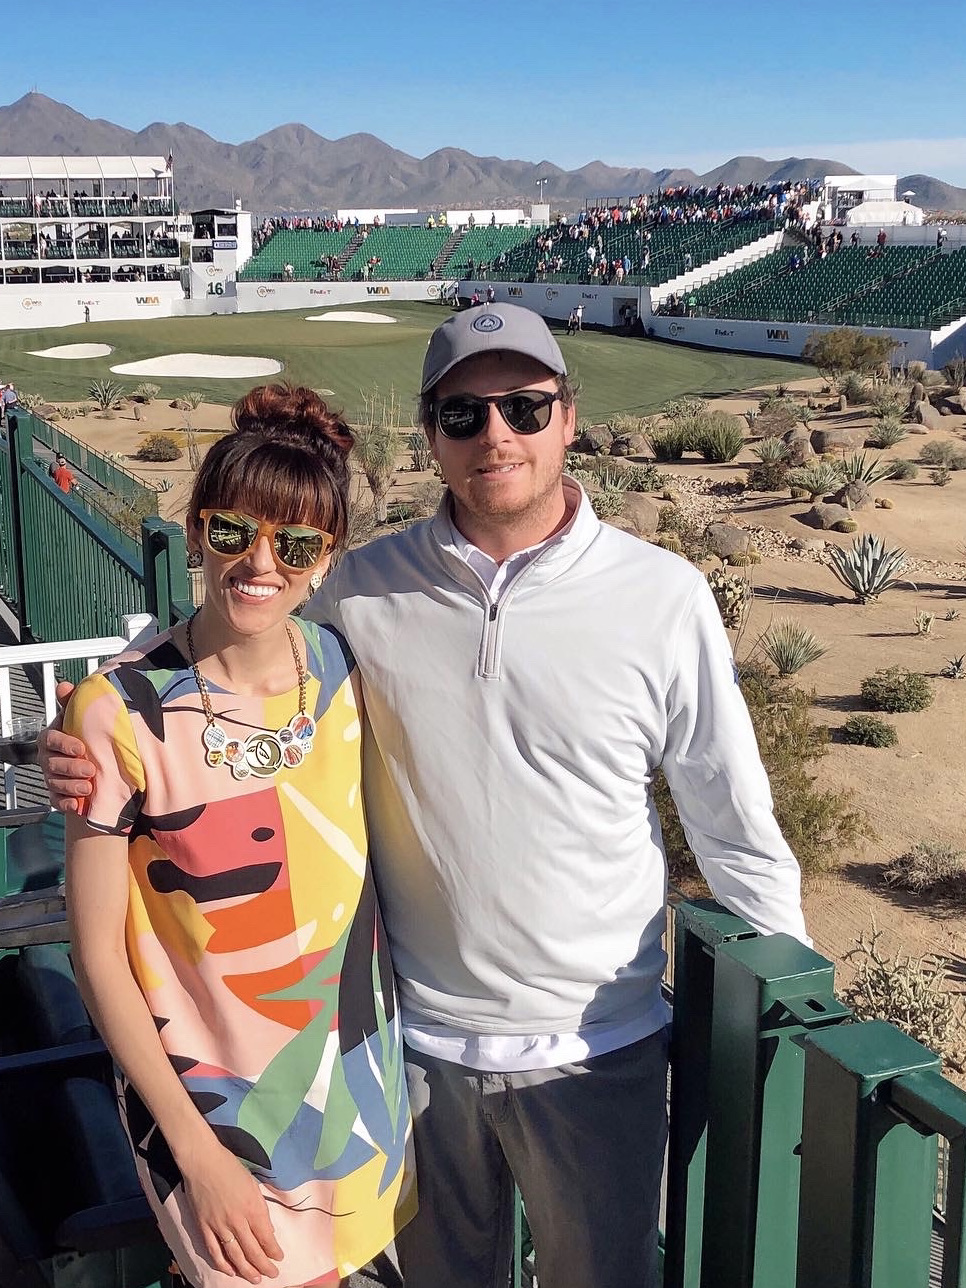 Alyssa Bird and her husband Nick Bahash at the Waste Management Phonix Open Golf Tournament